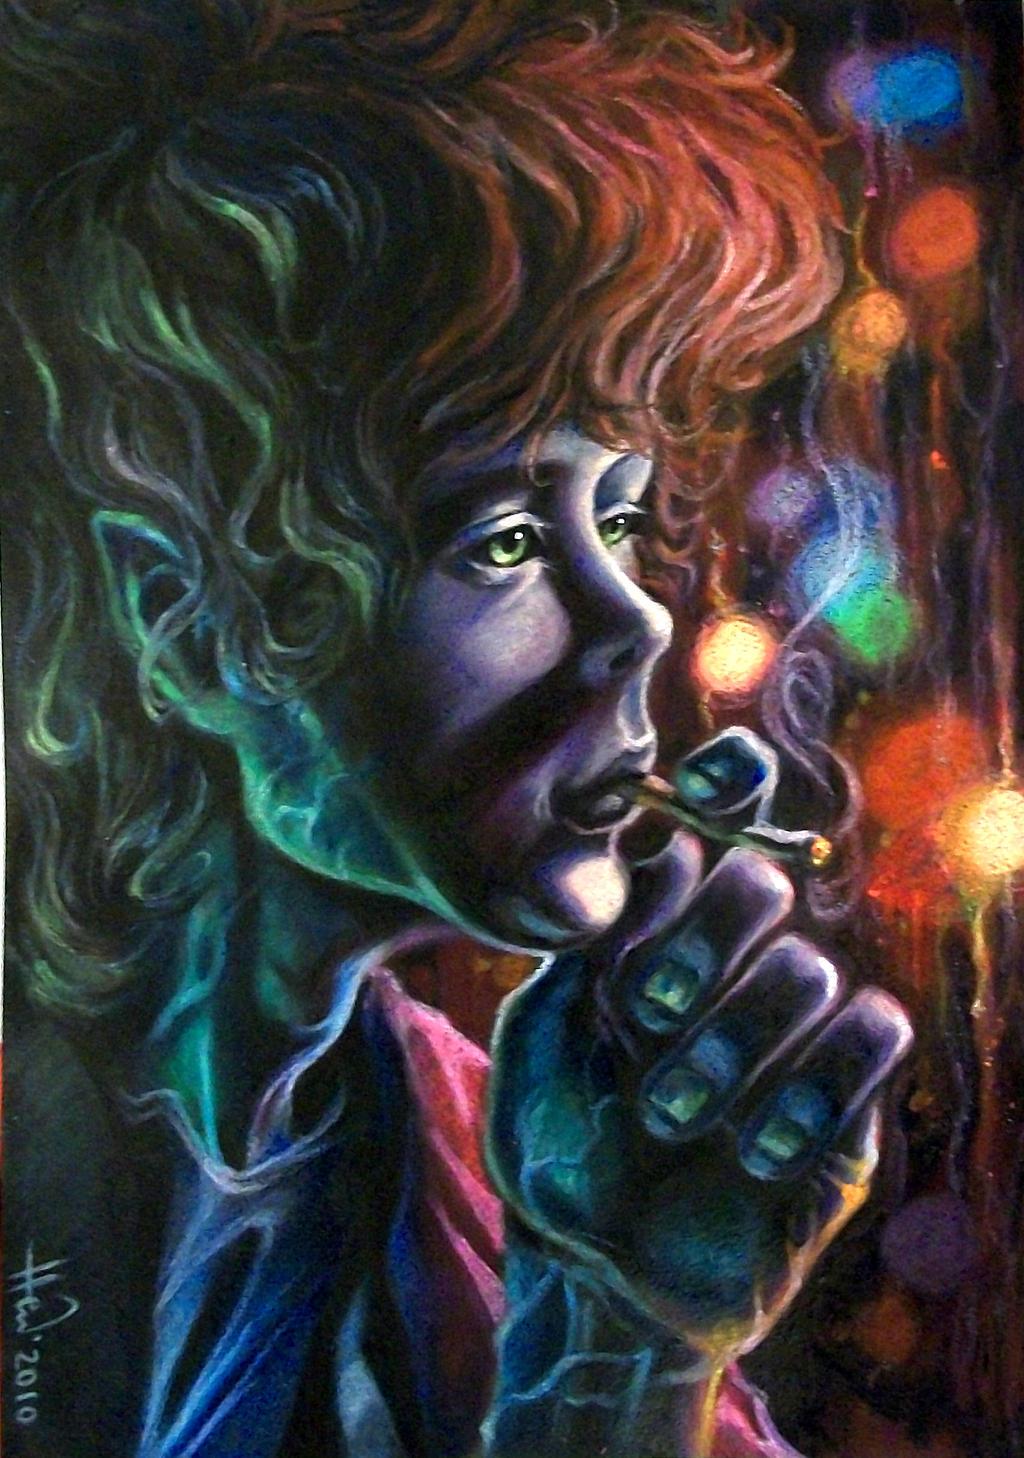 Smoking Man by Hewlann